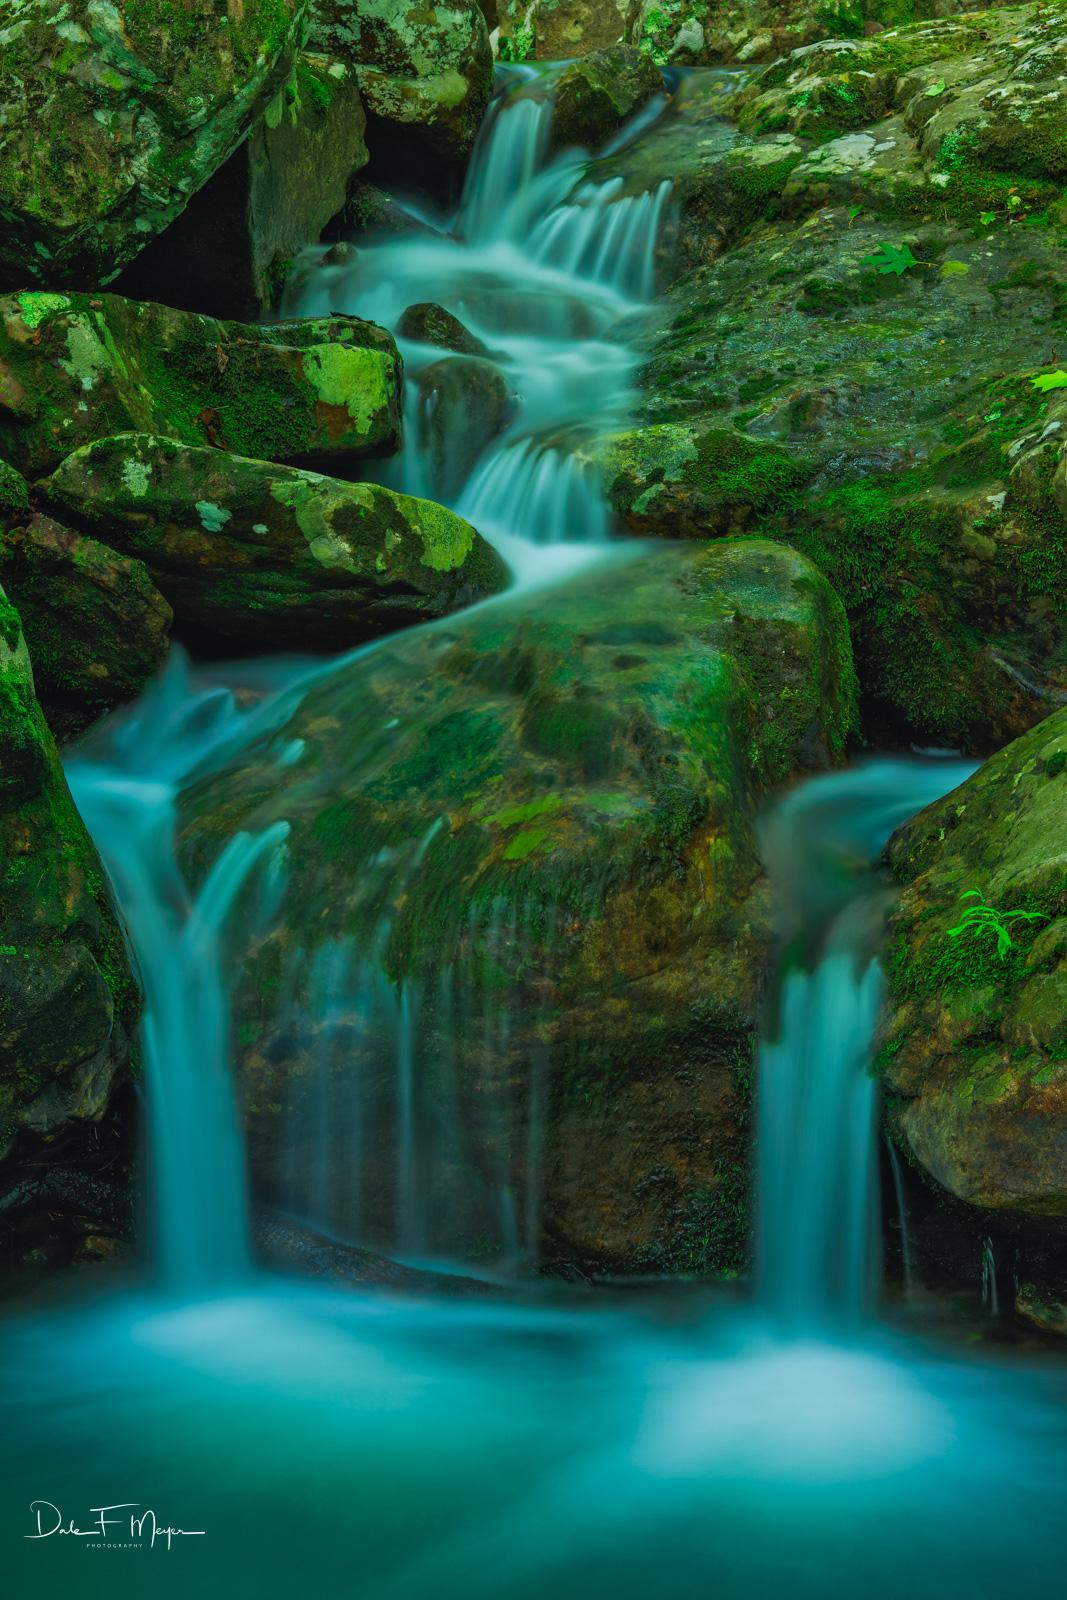 North Arkansas,falling water creek,rivers streams and waterfalls gallery, spring, waterfall, photo